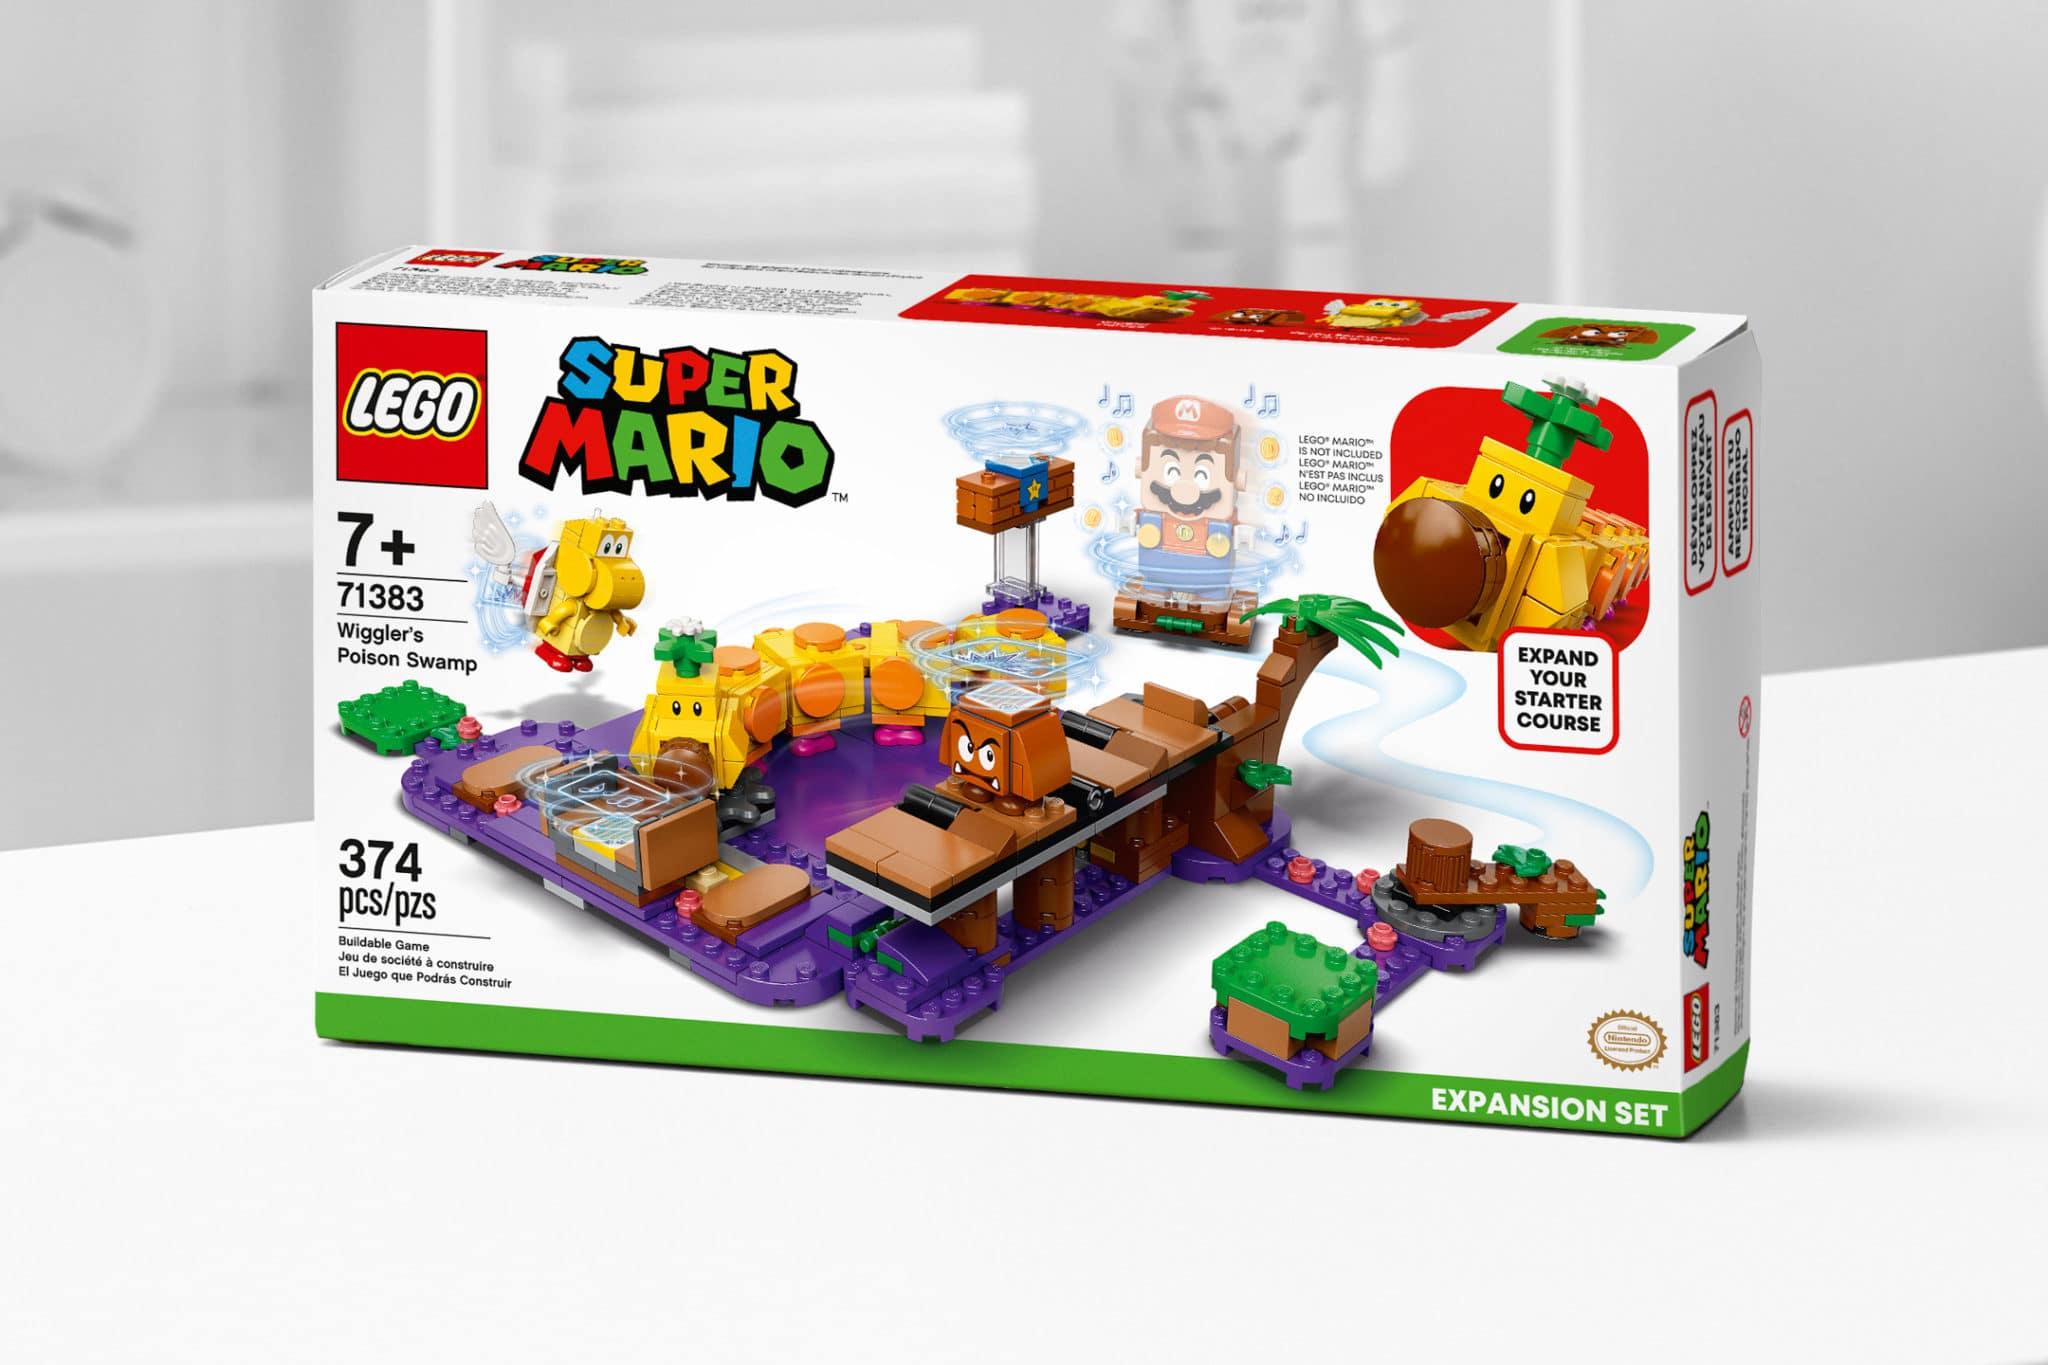 LEGO Super Mario 71383 Wigglers Poison Swamp 6